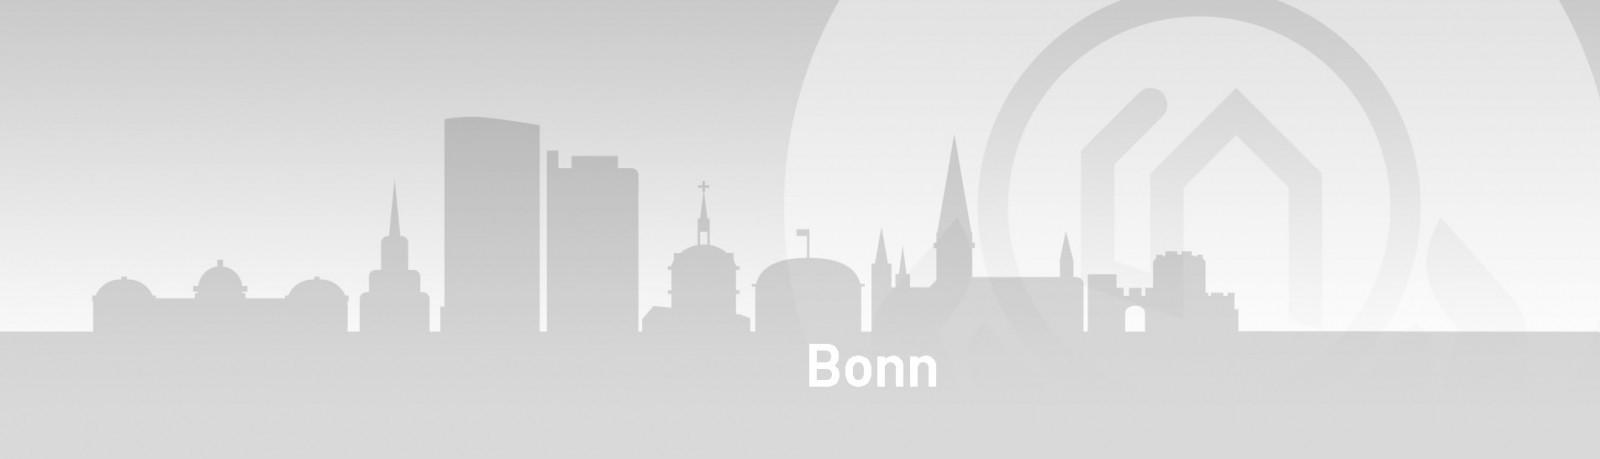 Bonn SENCURINA 1904x546 - Besondere Leistungen Bonn